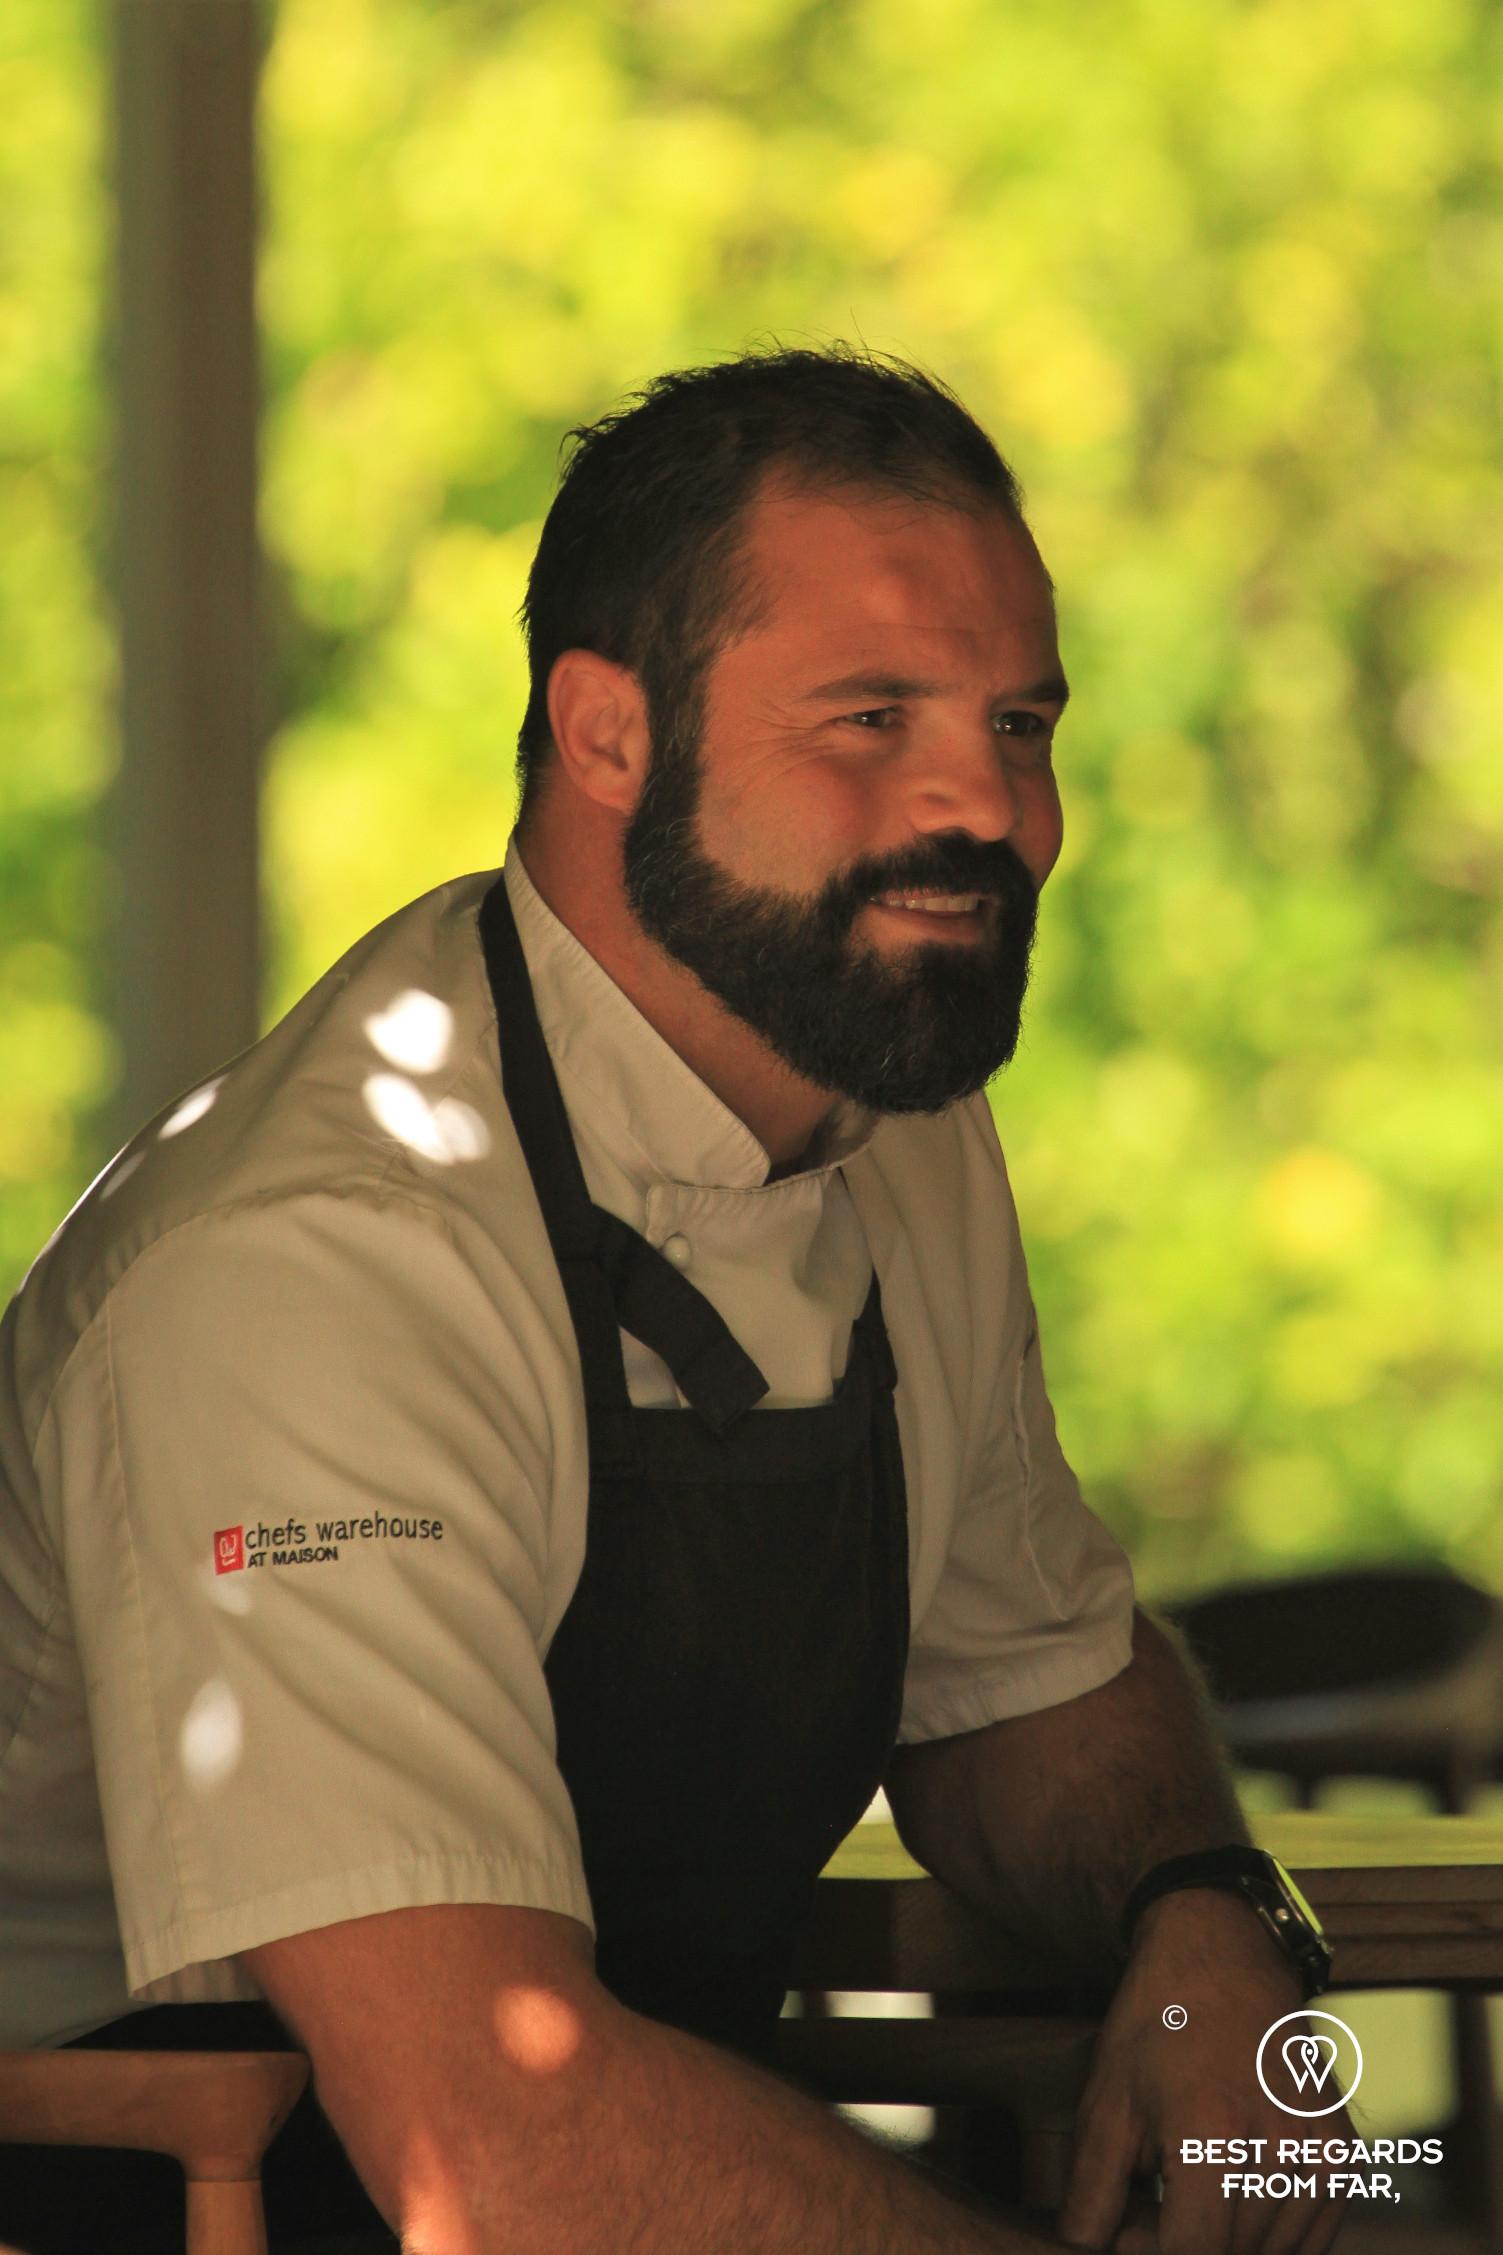 Portrait of head chef David Schneider at the Chefs Warehouse at Maison, Franschhoek